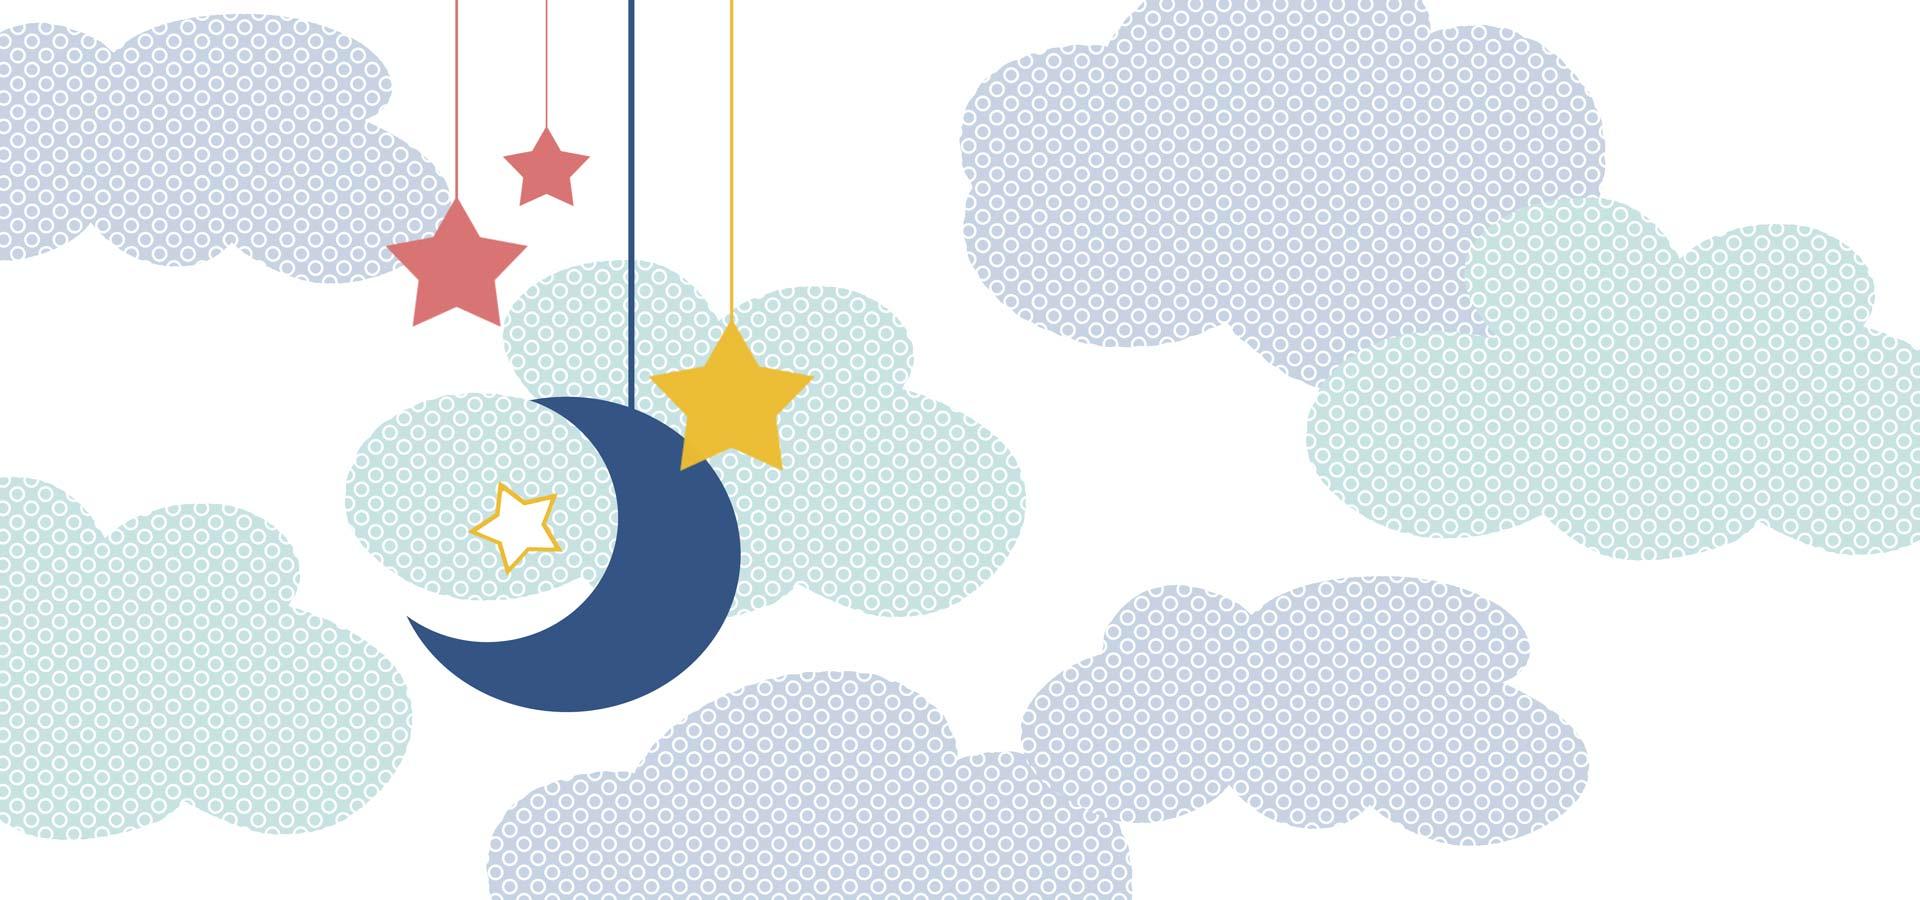 sfondo cartolina fiabaluna con nuvole, stelle, luna